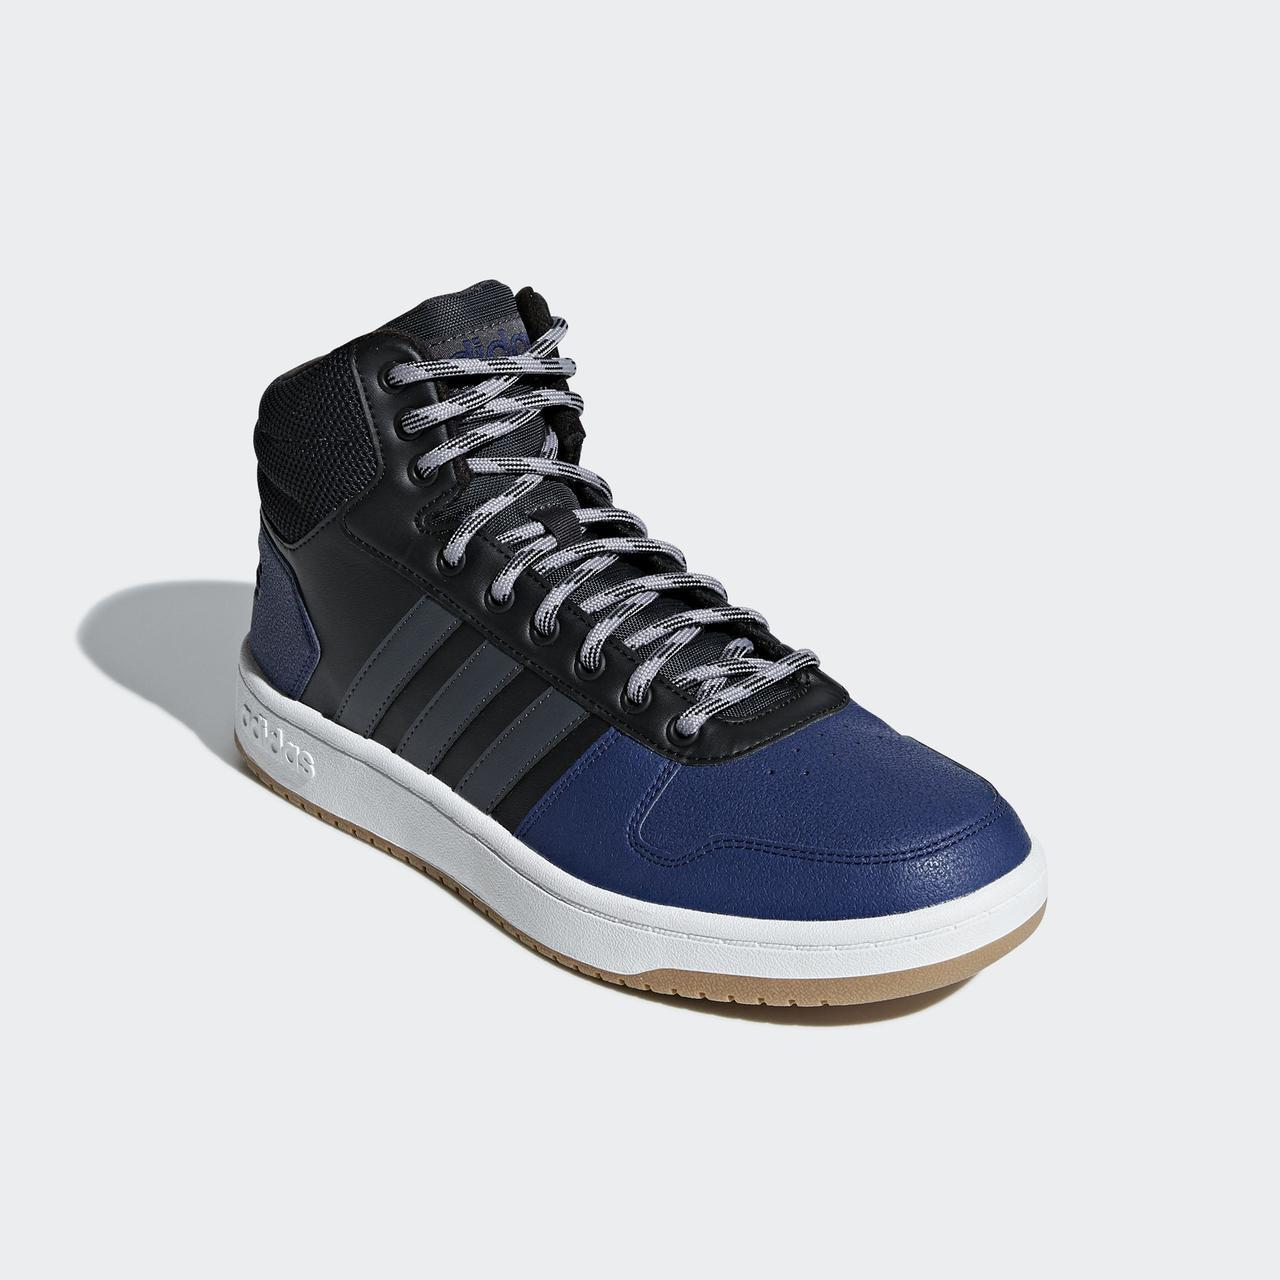 ... Мужские высокие кроссовки Adidas Hoops 2.0 Mid B44613 - 2018 2, фото 4  ... 3a5d0a617ed